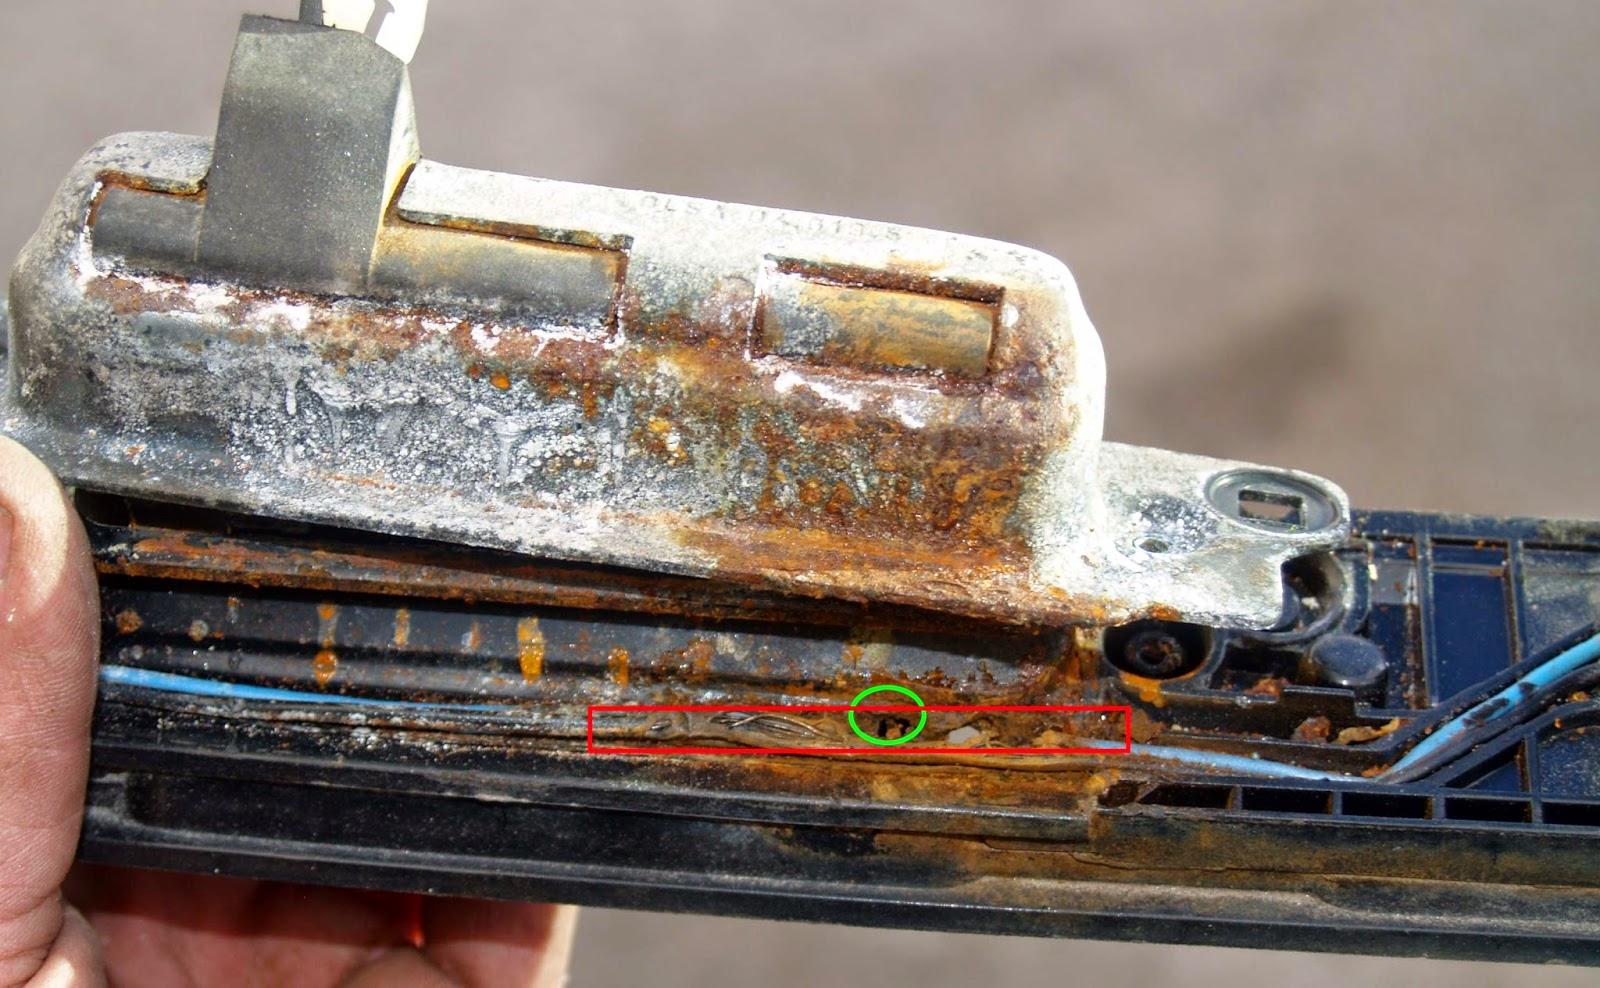 JB Service: SAAB 9-3 SE 2.0T,1999, fuse 29 keep blowing.